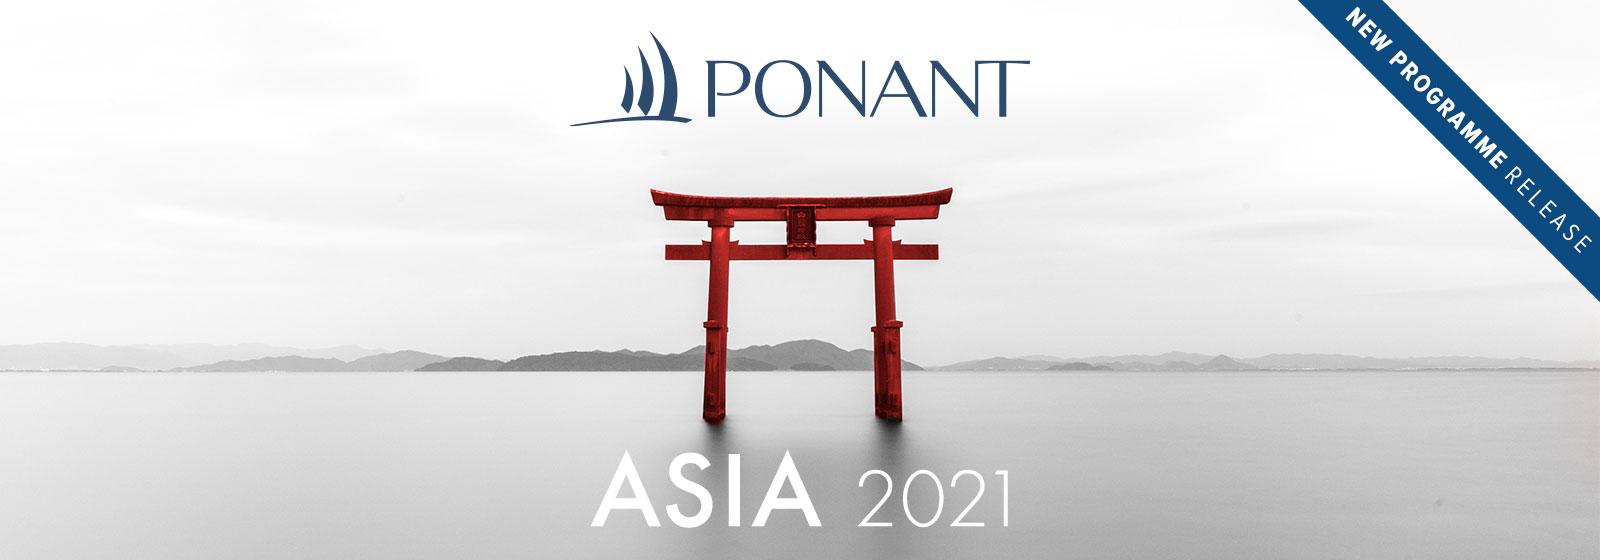 Ponant - Asia 2021